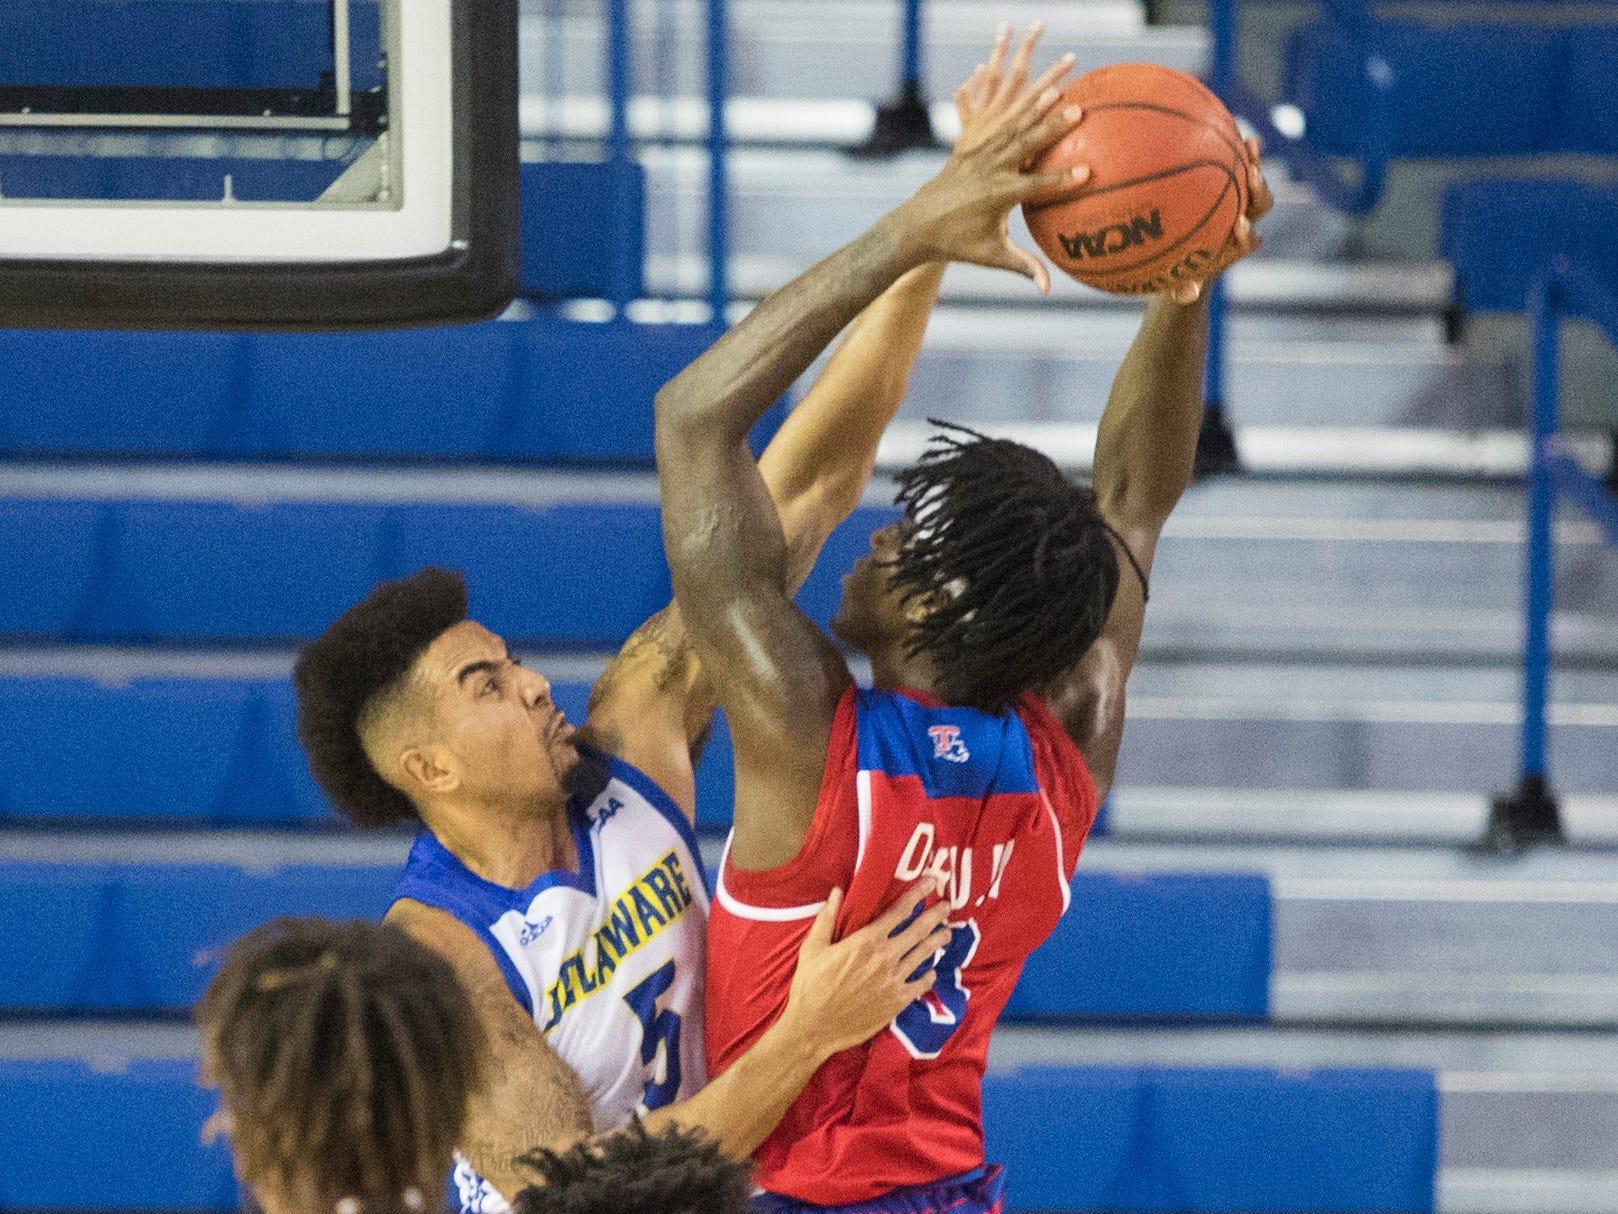 Delaware's Eric Carter (5) rises up against Louisiana Tech's  Anthony Duruji (10) Monday at the Bob Carpenter Center. Delaware defeated Louisiana Tech 75-71.